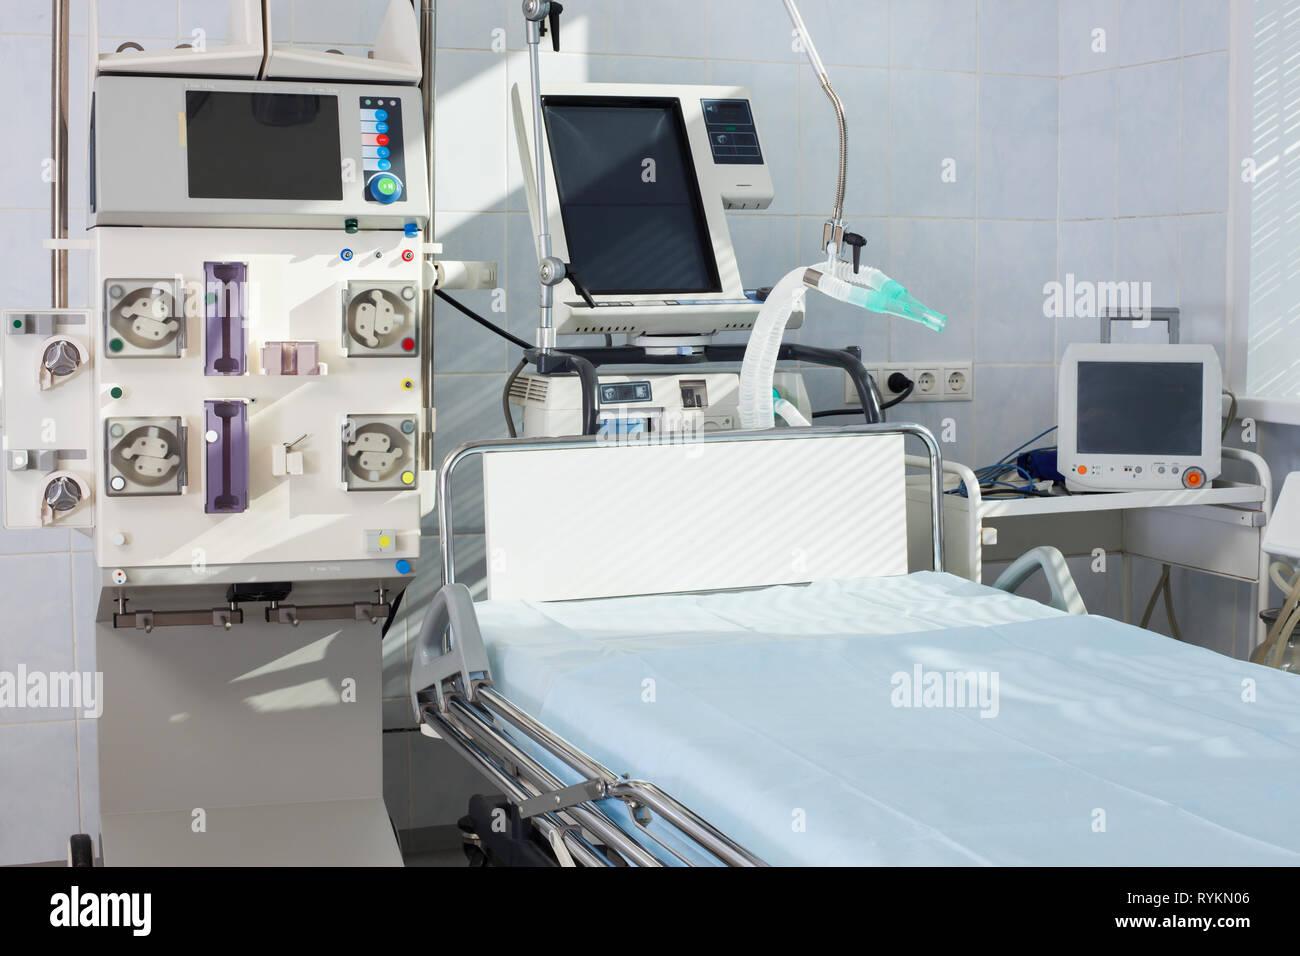 Emergency room - Stock Image